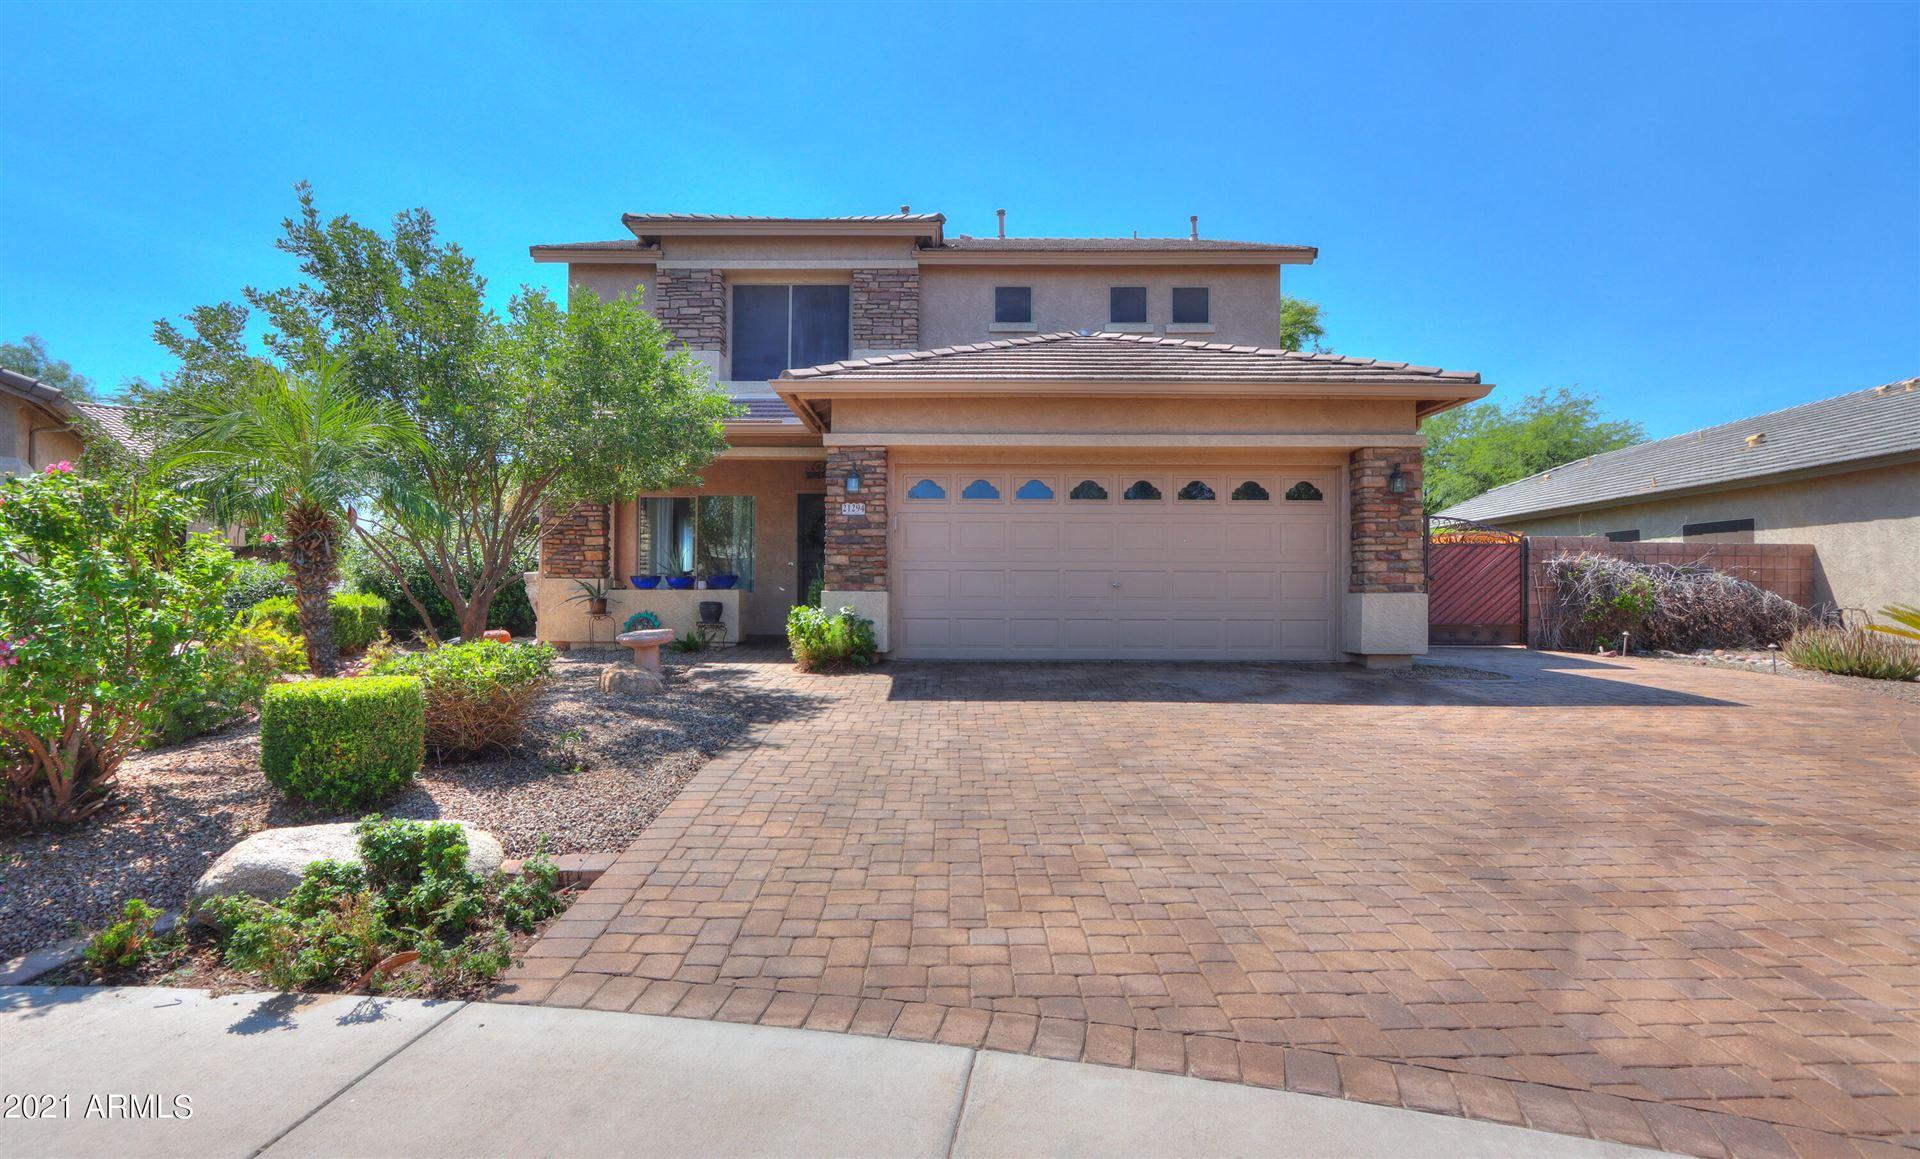 Photo of 21294 N SUNSET Drive, Maricopa, AZ 85139 (MLS # 6296466)